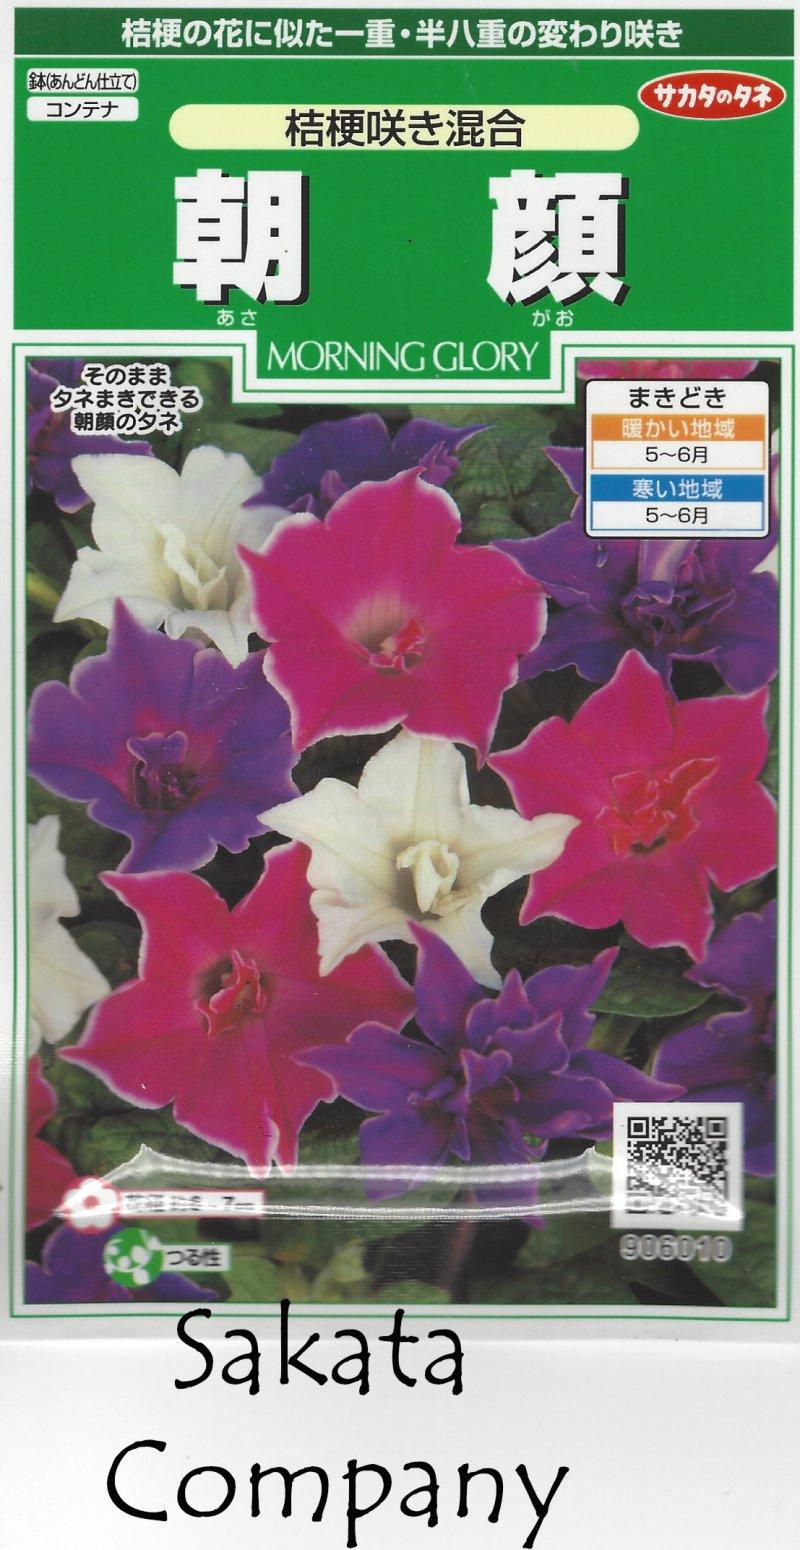 Image 4 of Japanese Morning Glory Seeds: Kikyouzaki Mix, Platycodon / Picotee Mix